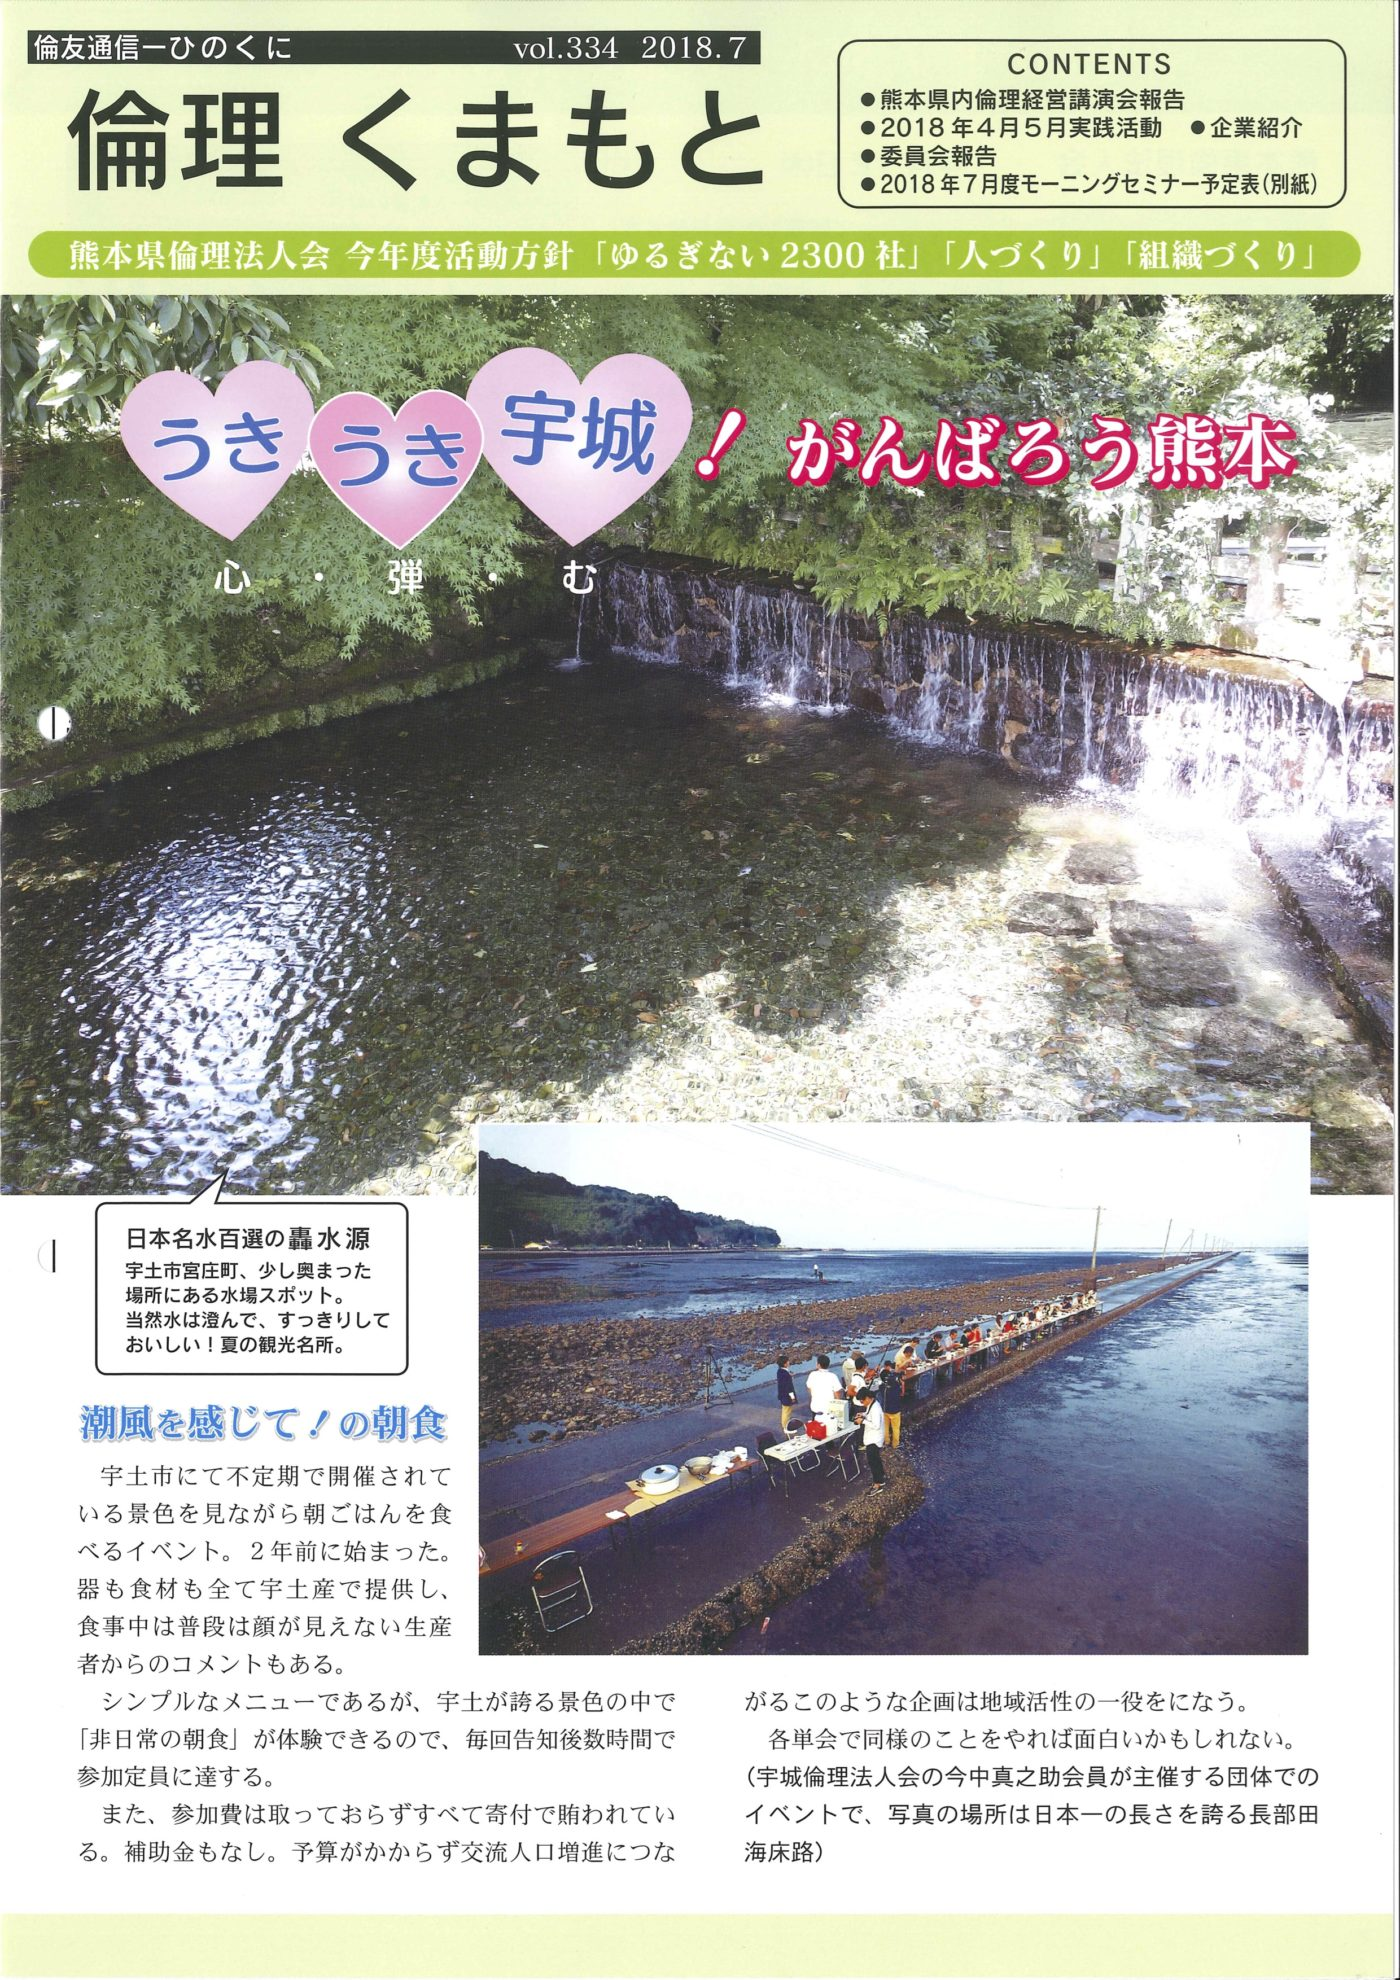 kaihou_330.jpg